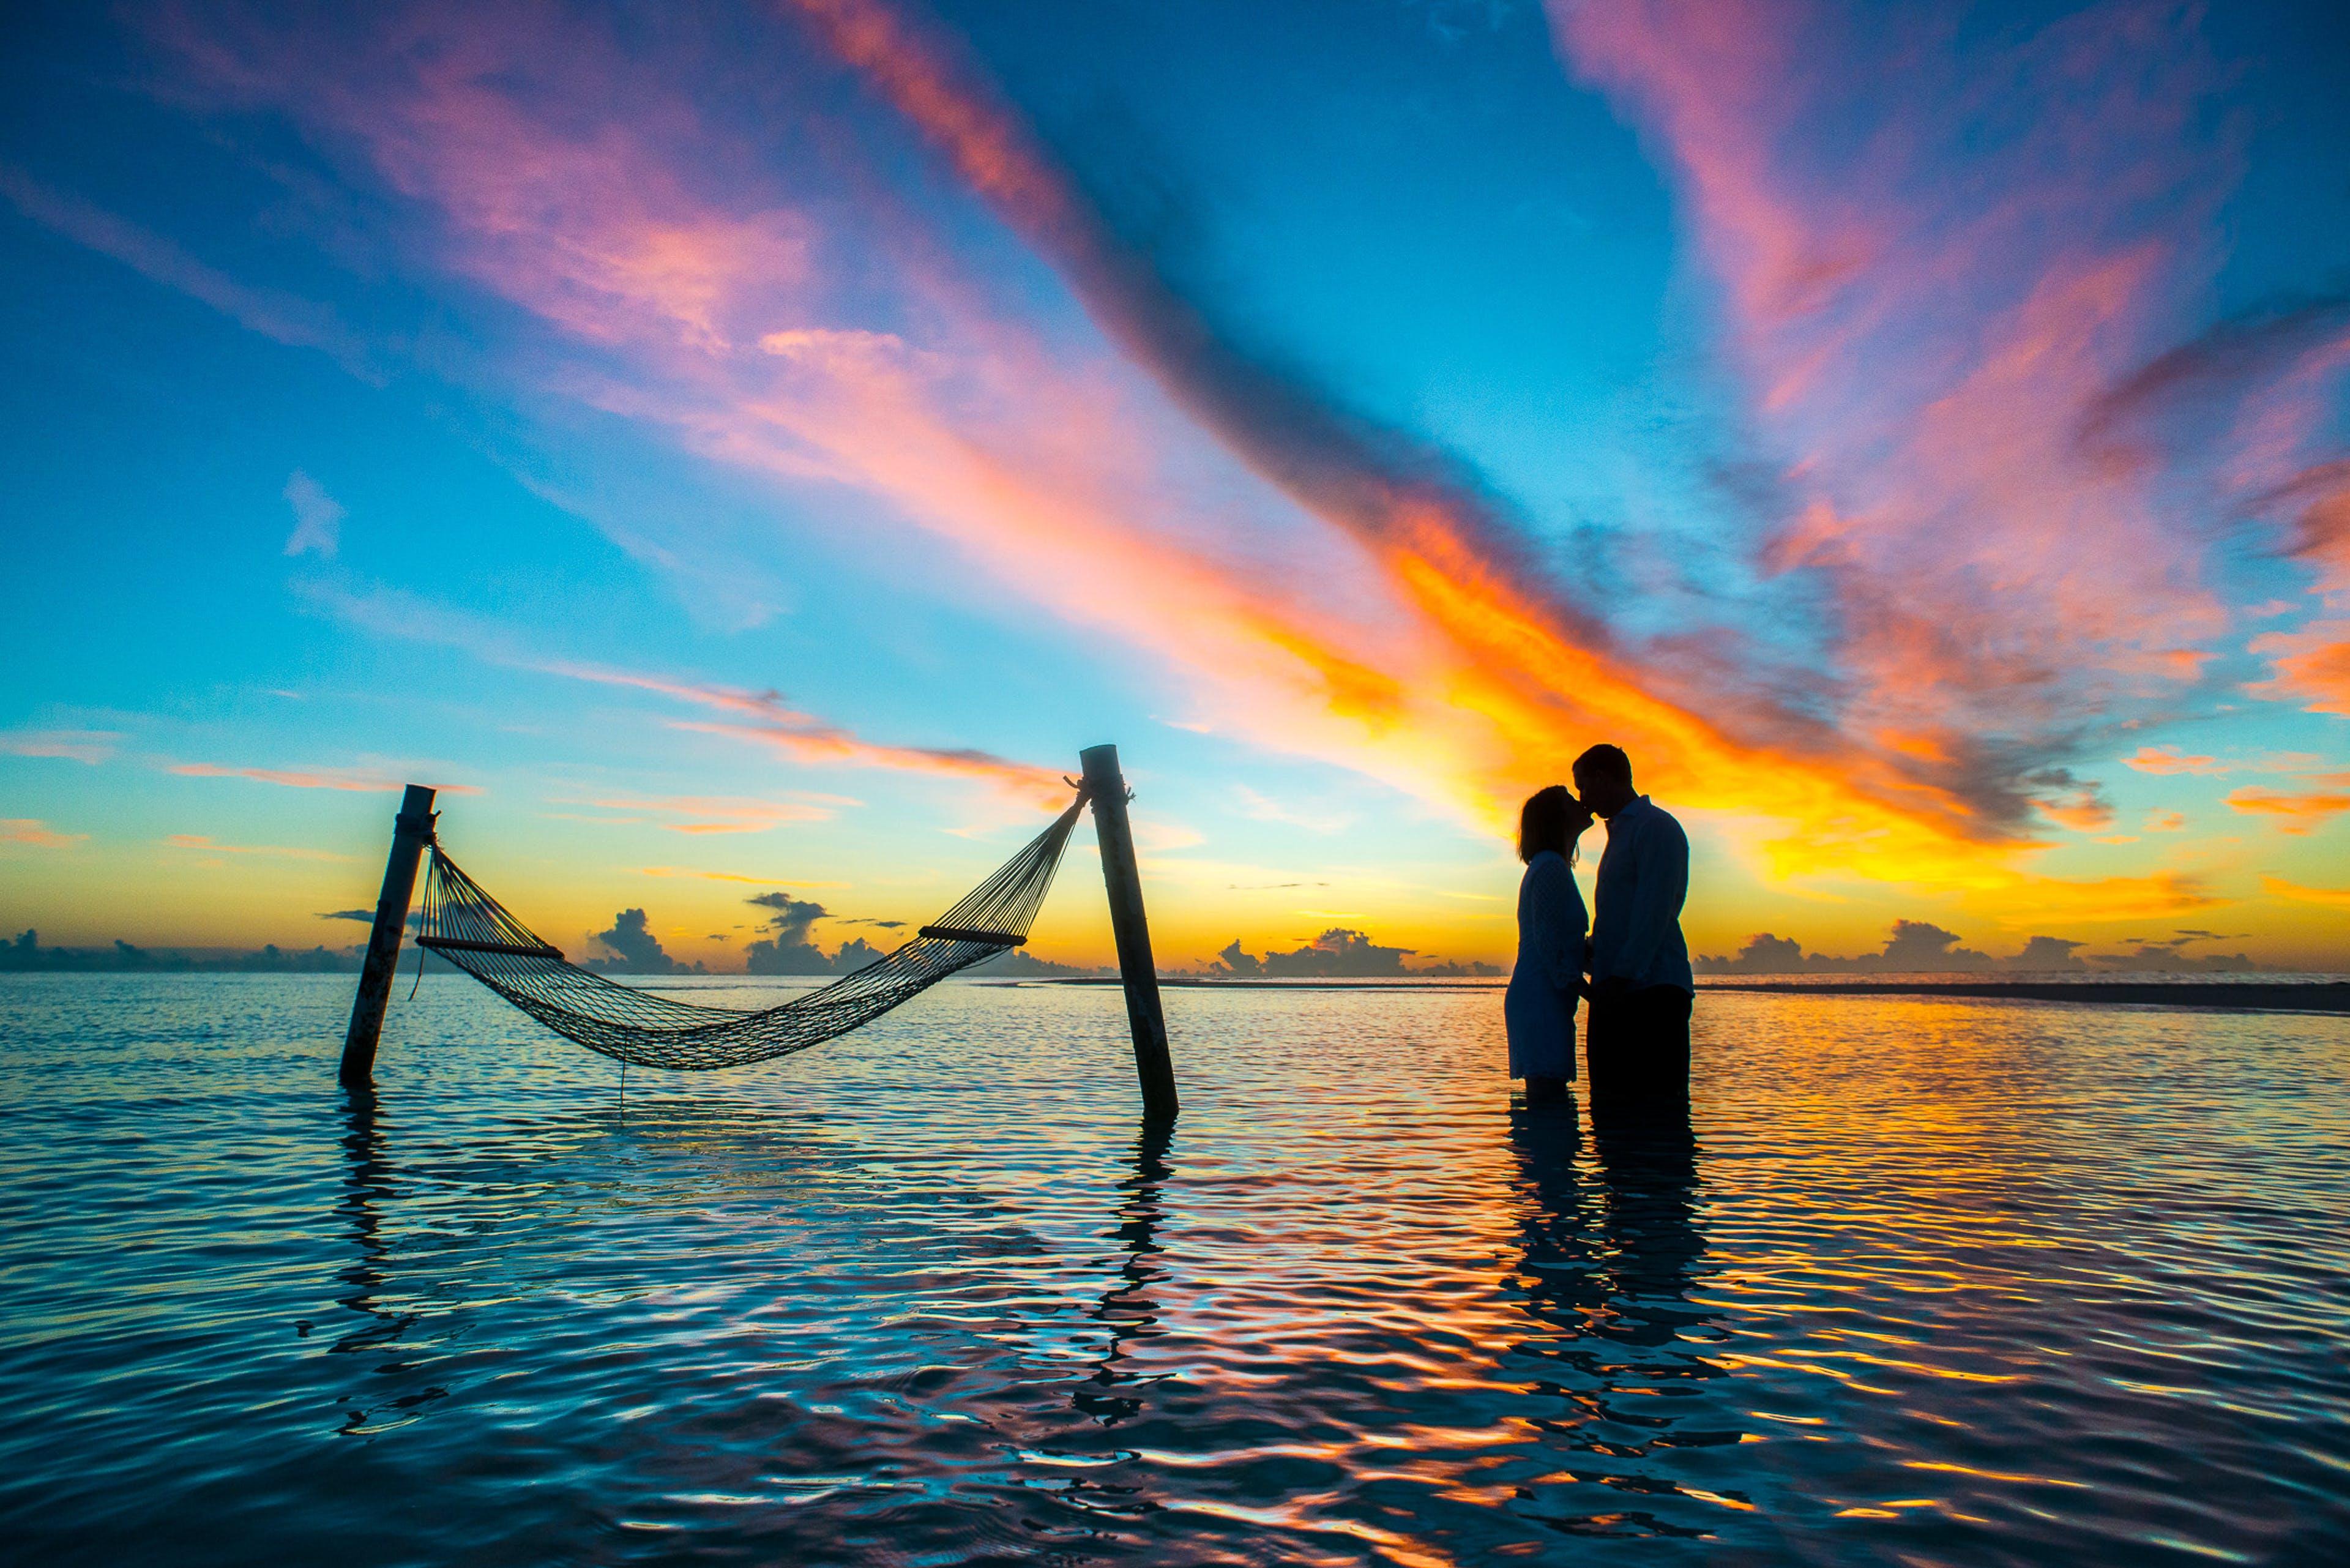 Fotos de stock gratuitas de agua, amanecer, amor, aniversario